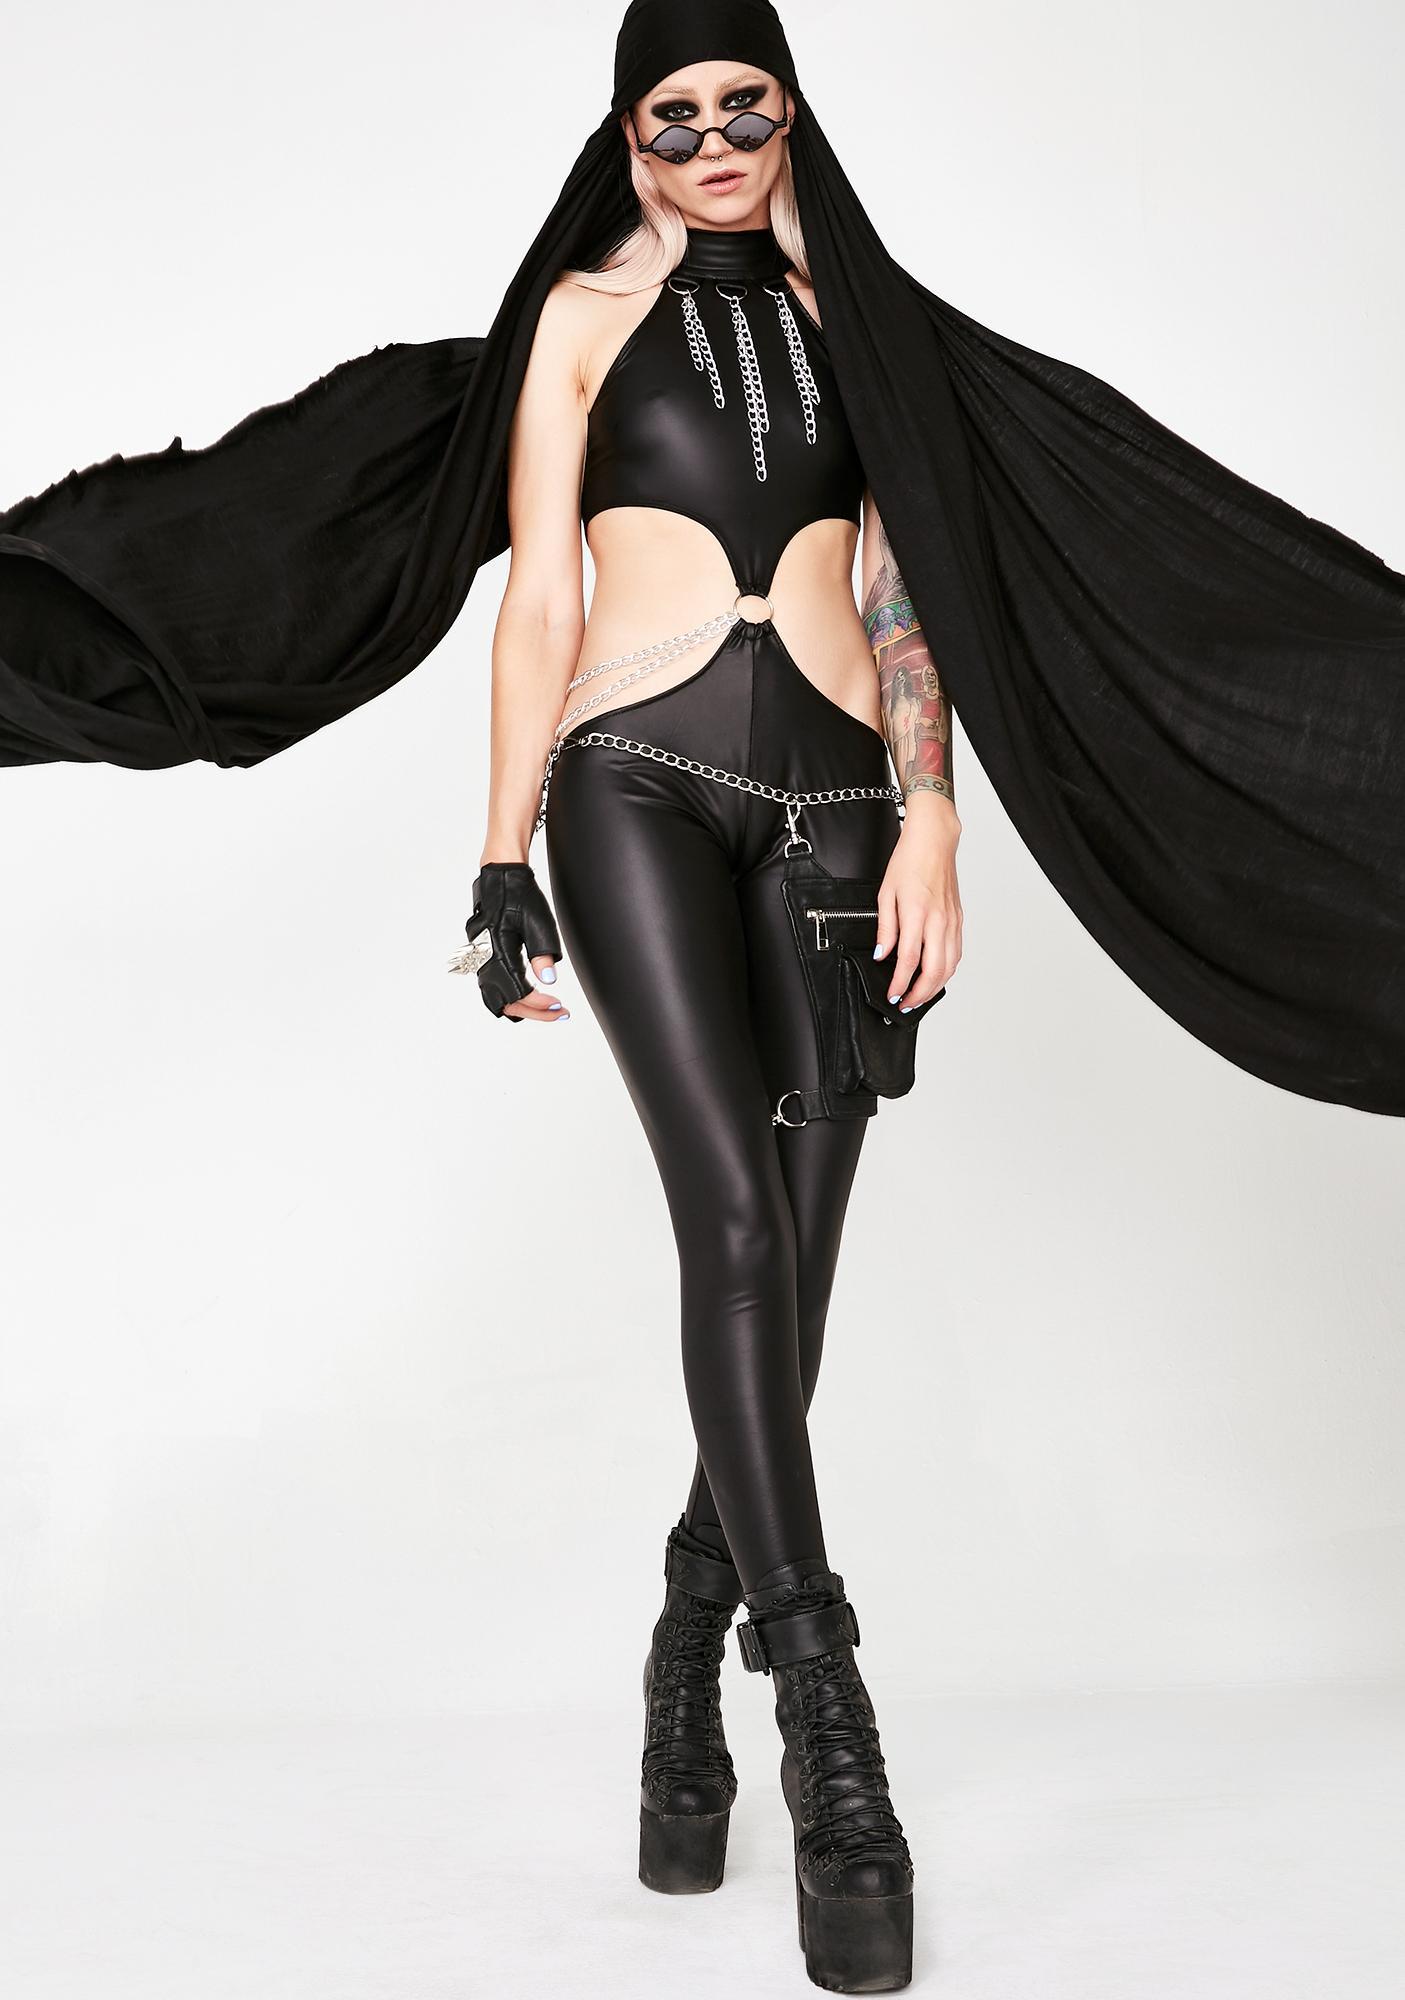 Club Exx Nocturnal Seductress Chain Catsuit